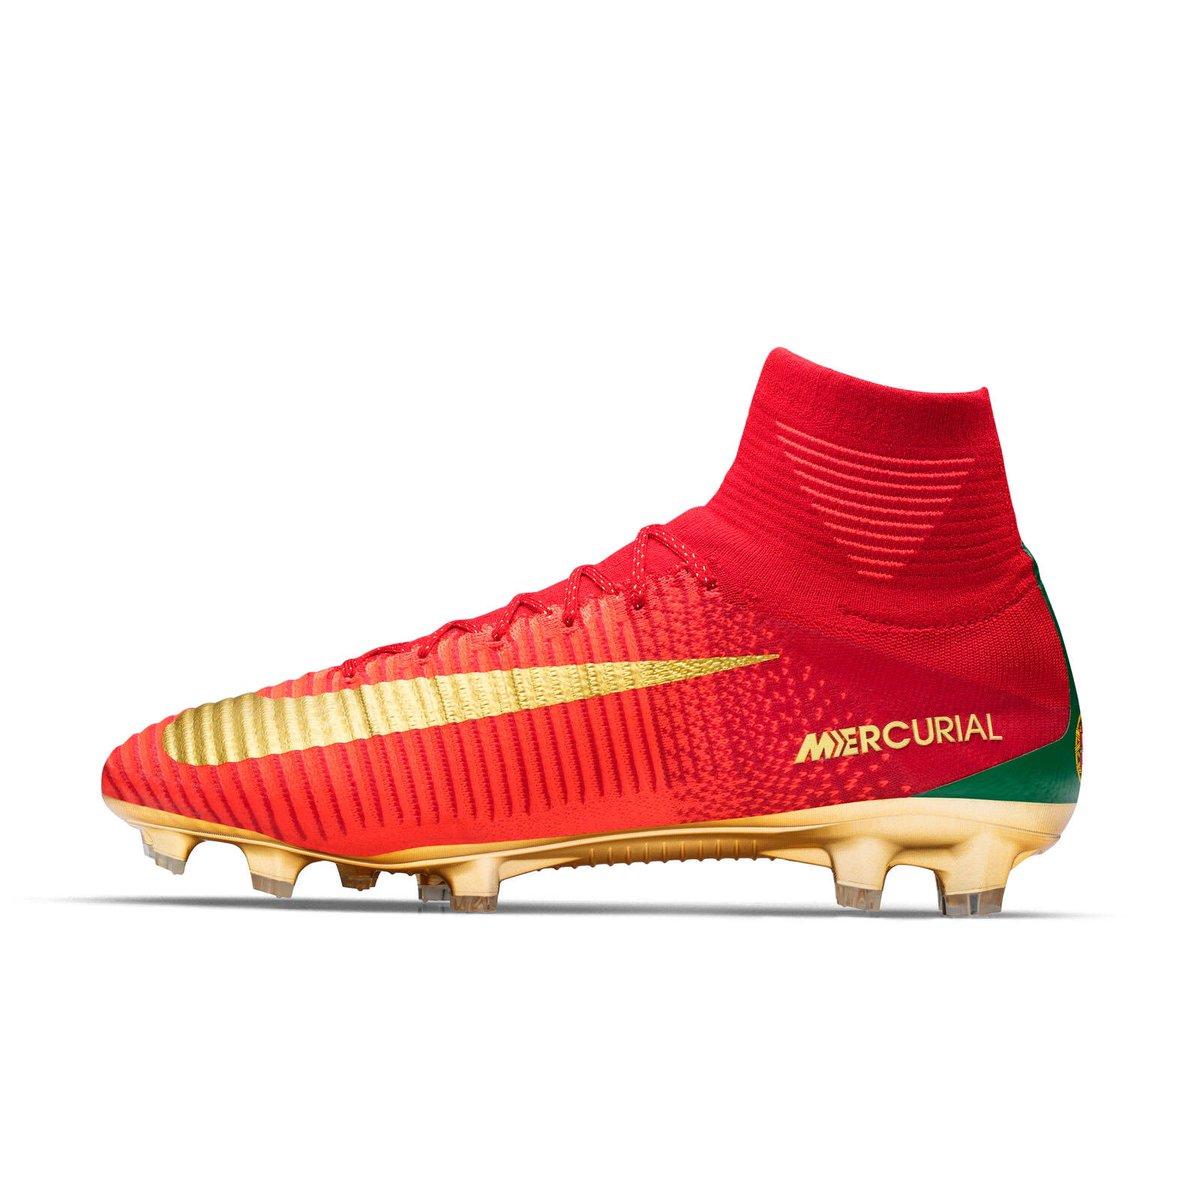 00c05246937 The Nike CR7 Mercurial Campeões. 🇵🇹 pic.twitter.com SICr7jbnfI